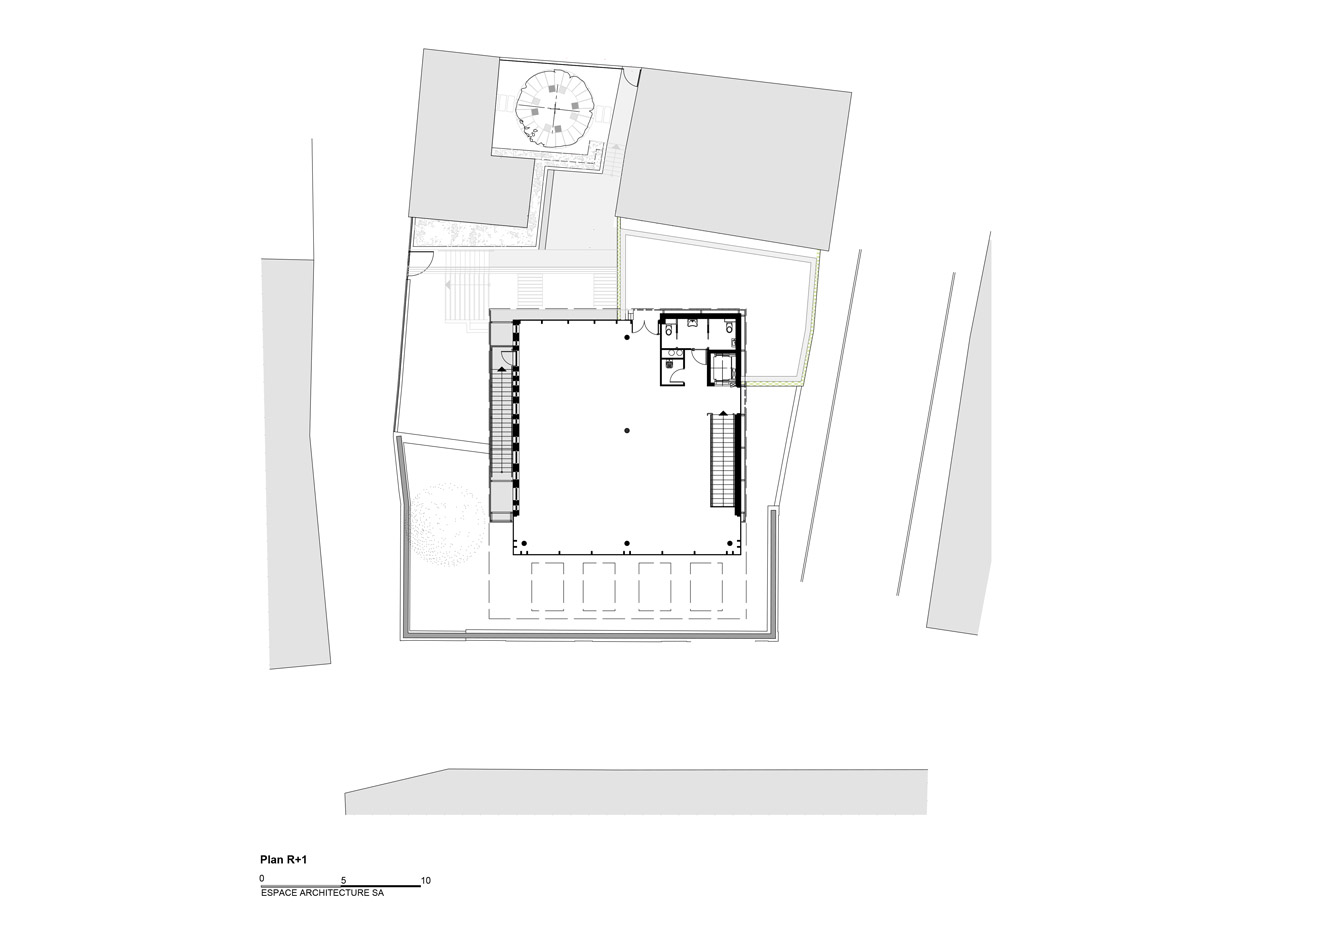 Mediatheque-Faulquemont_Plan-R+1